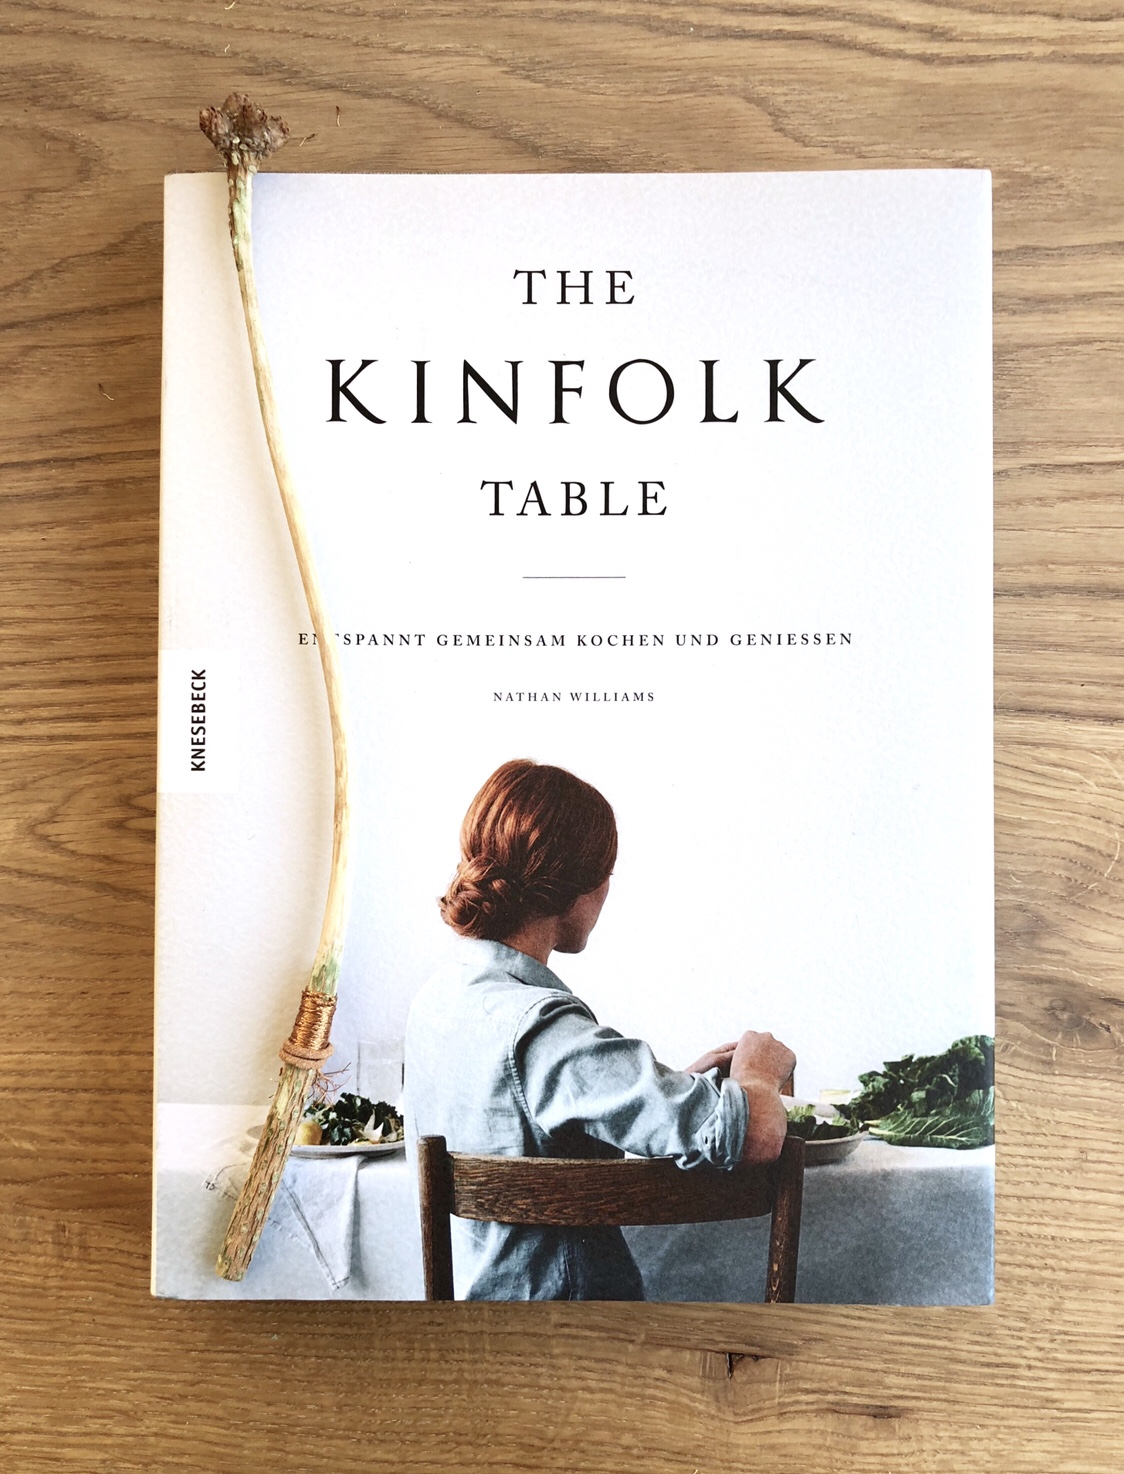 Freitagslieblinge, The Kinfolk Table